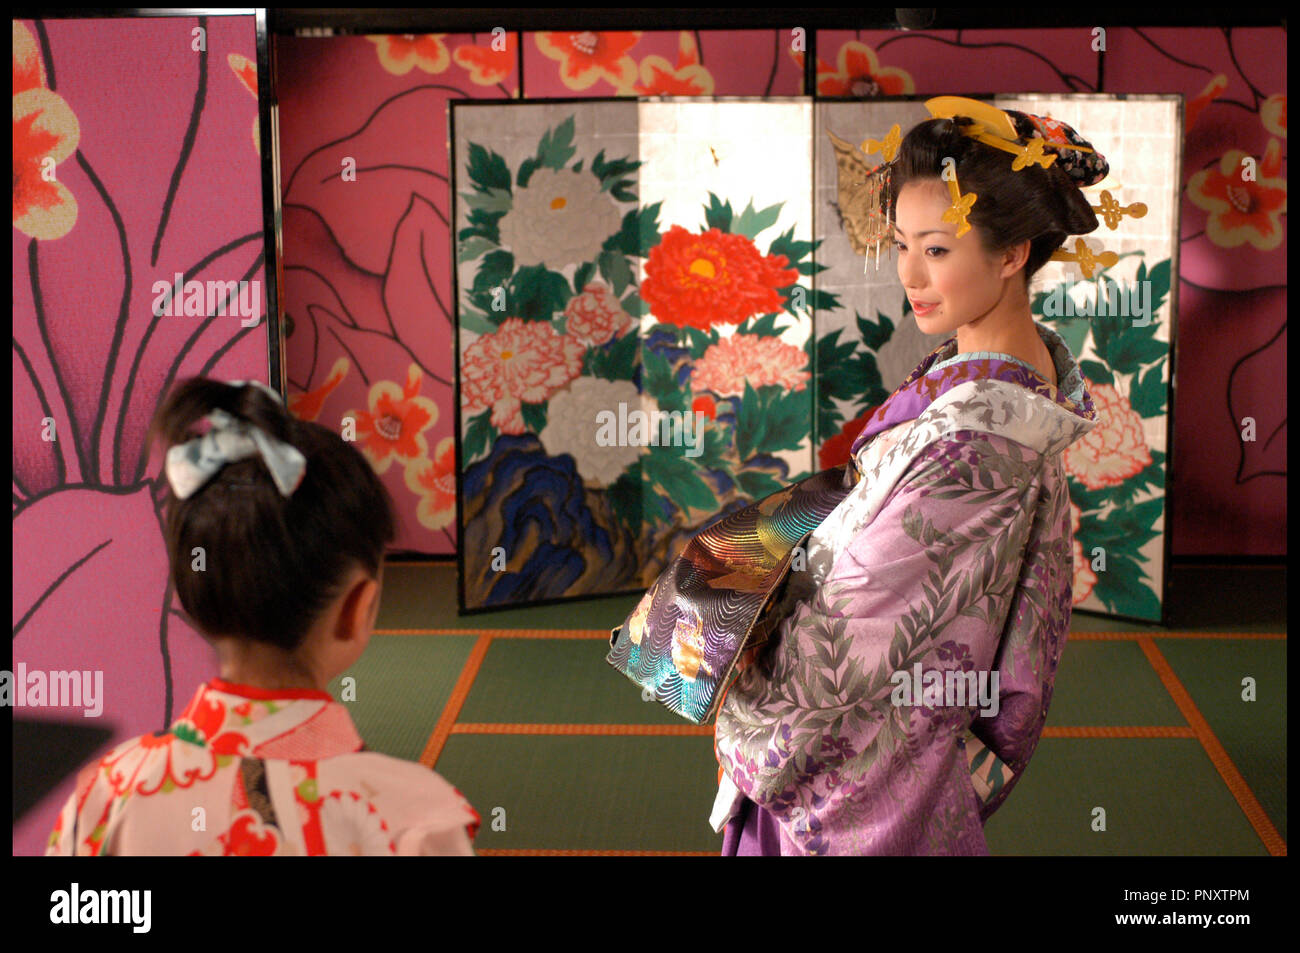 Prod Db A C Fellah Pictures Dr Sakuran De Mika Ninagawa 2006 Jap